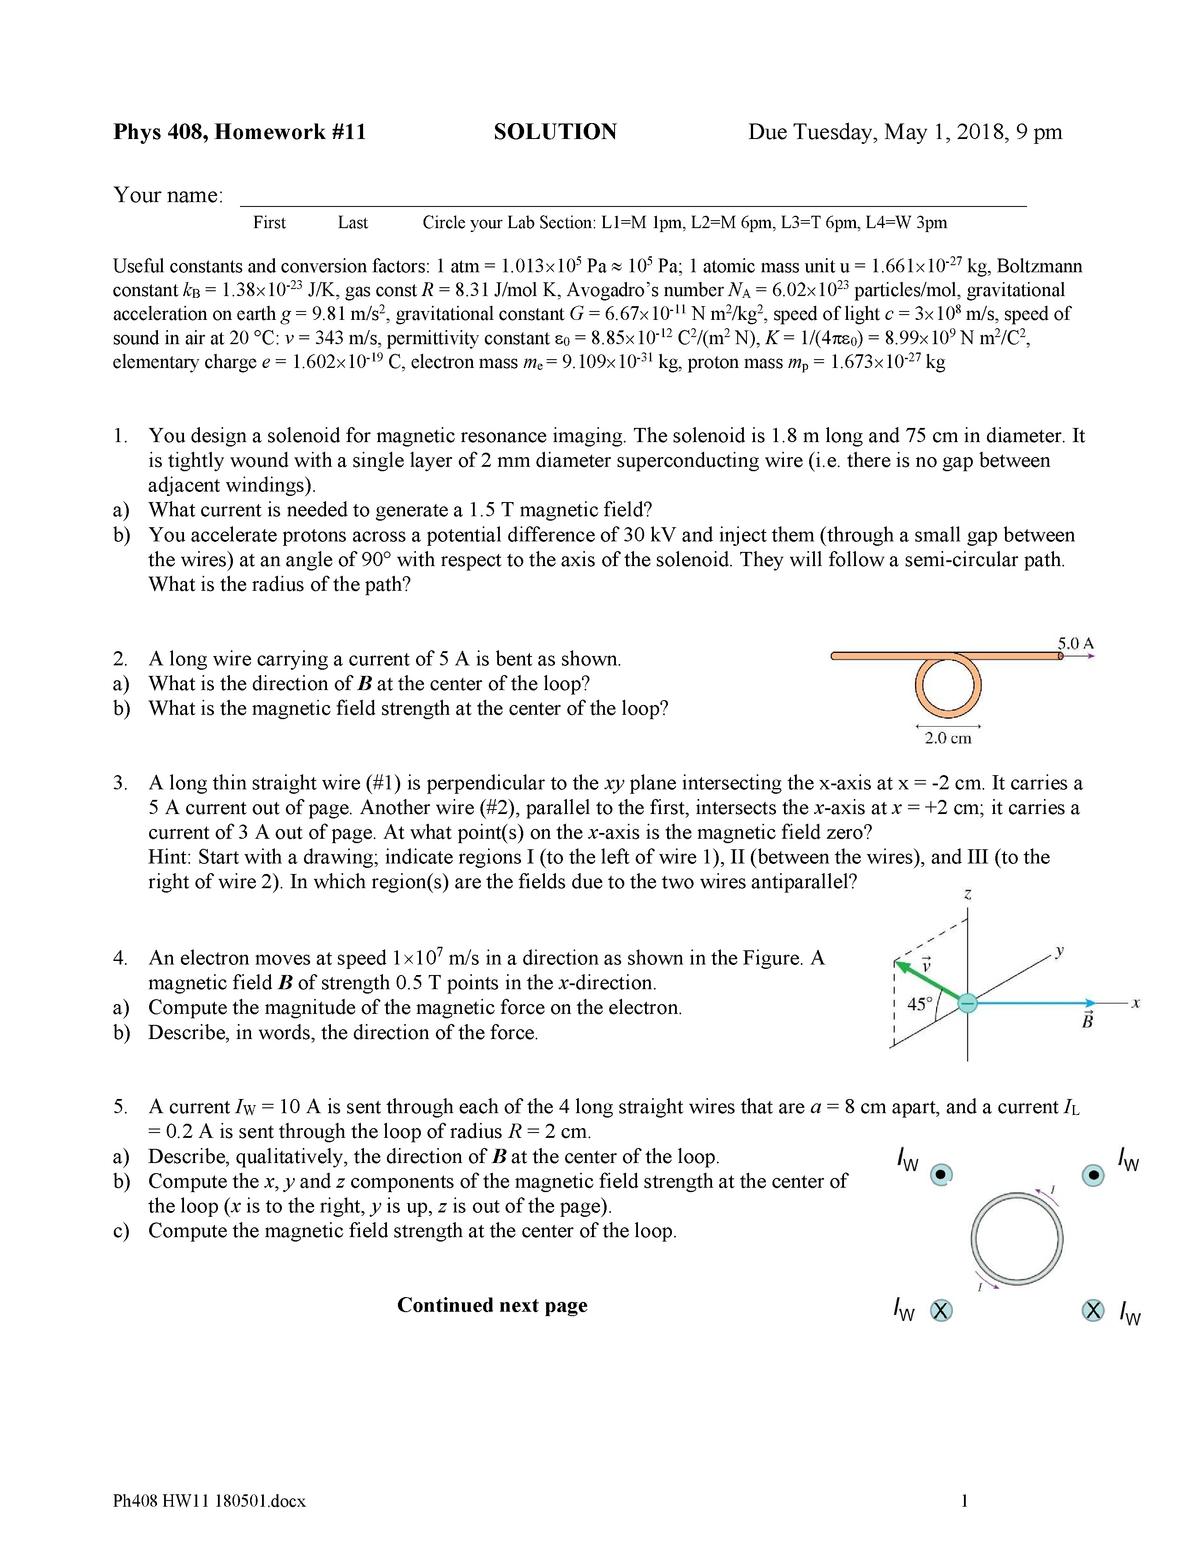 Homework 11 Solutions - PHYS 408: General Physics Ii Lab